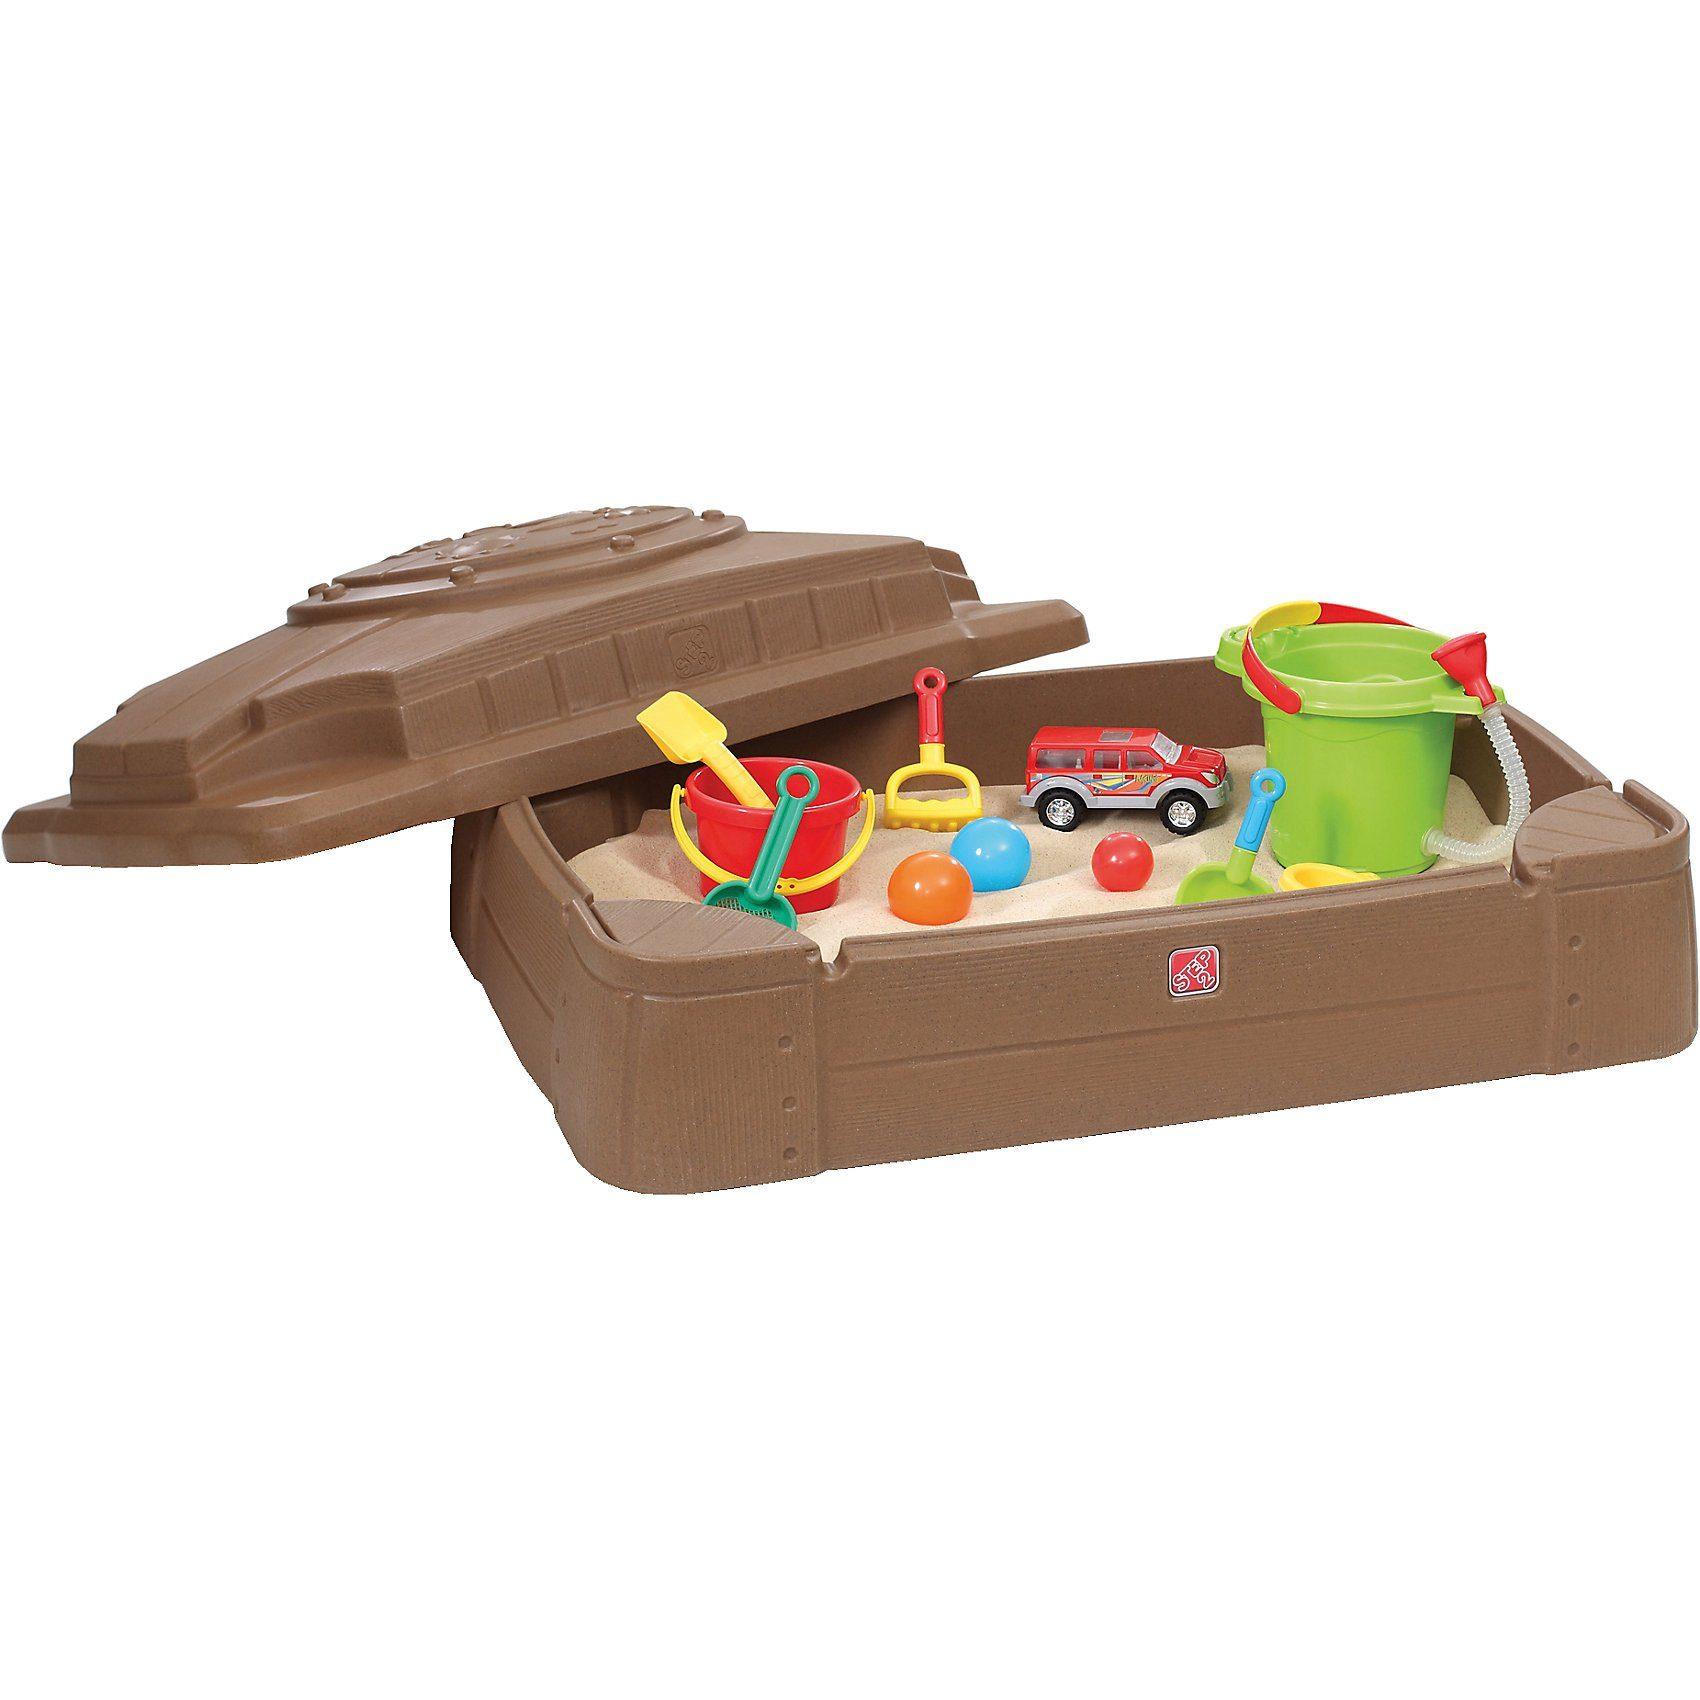 Play & Store Sandbox